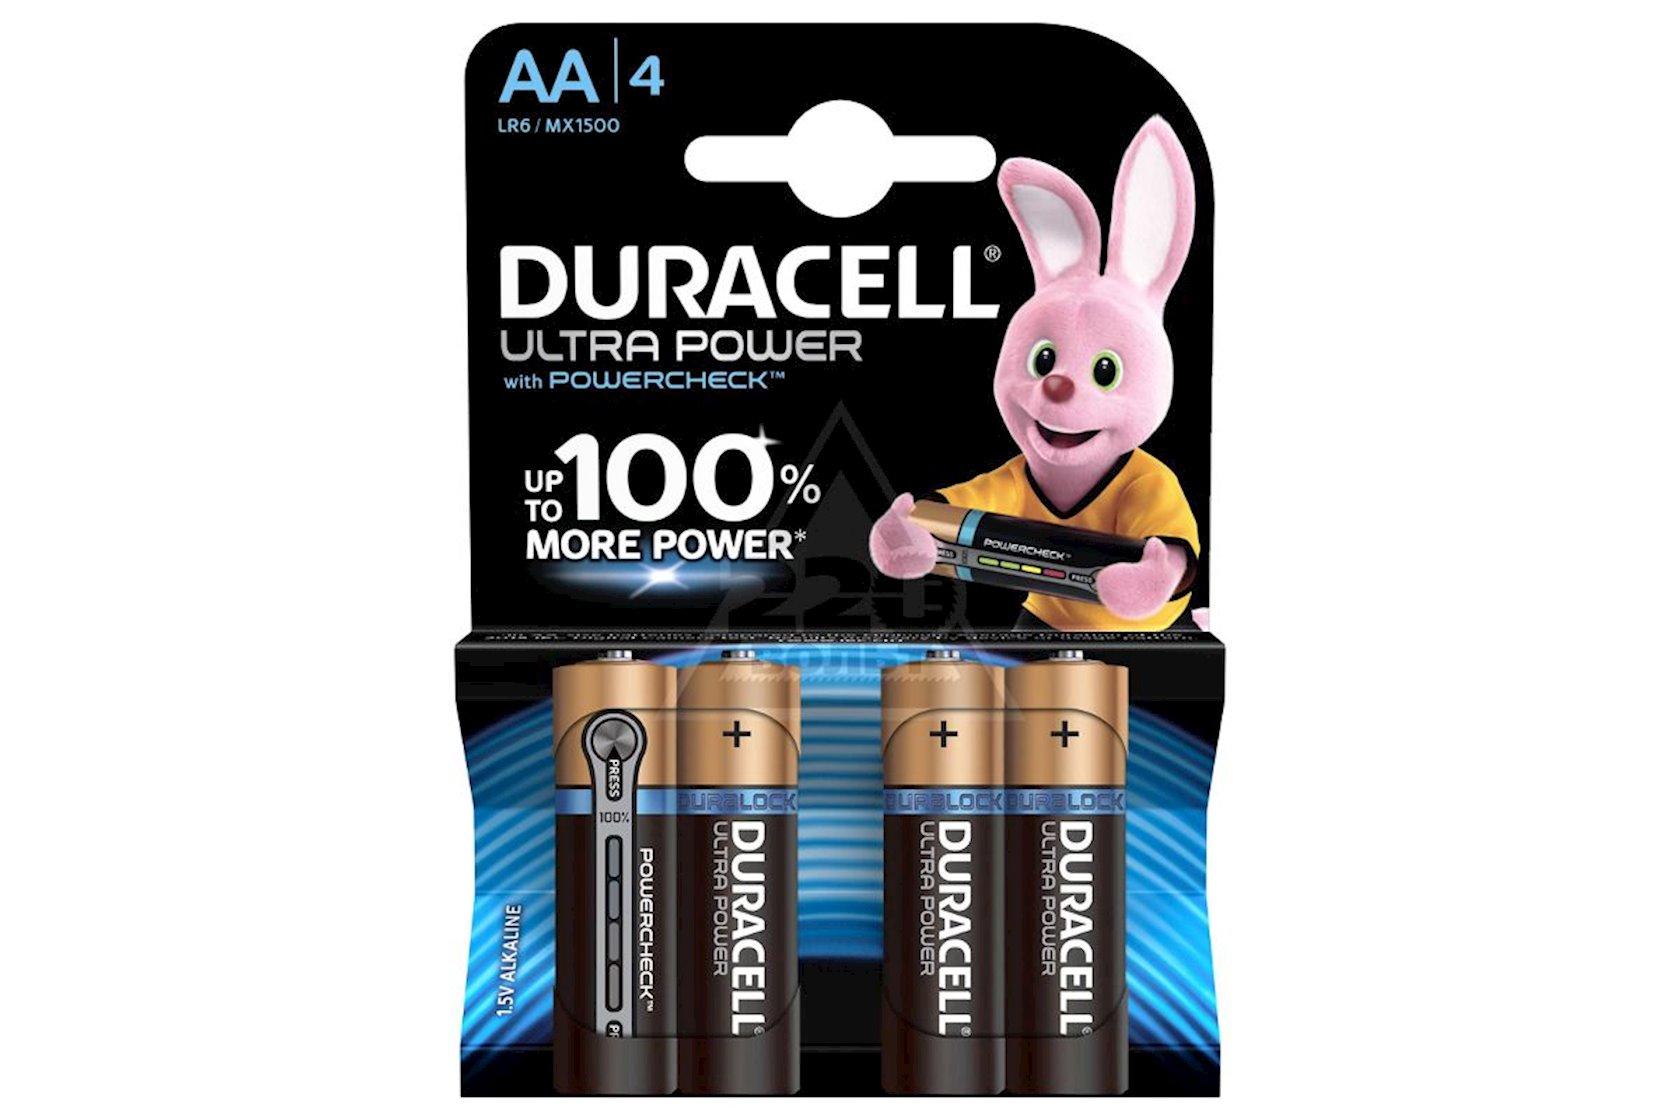 Batareya Duracell Ultra Power AA MN1500 LR6, 1.5V, 4 əd, 92x84 mm, 96 q